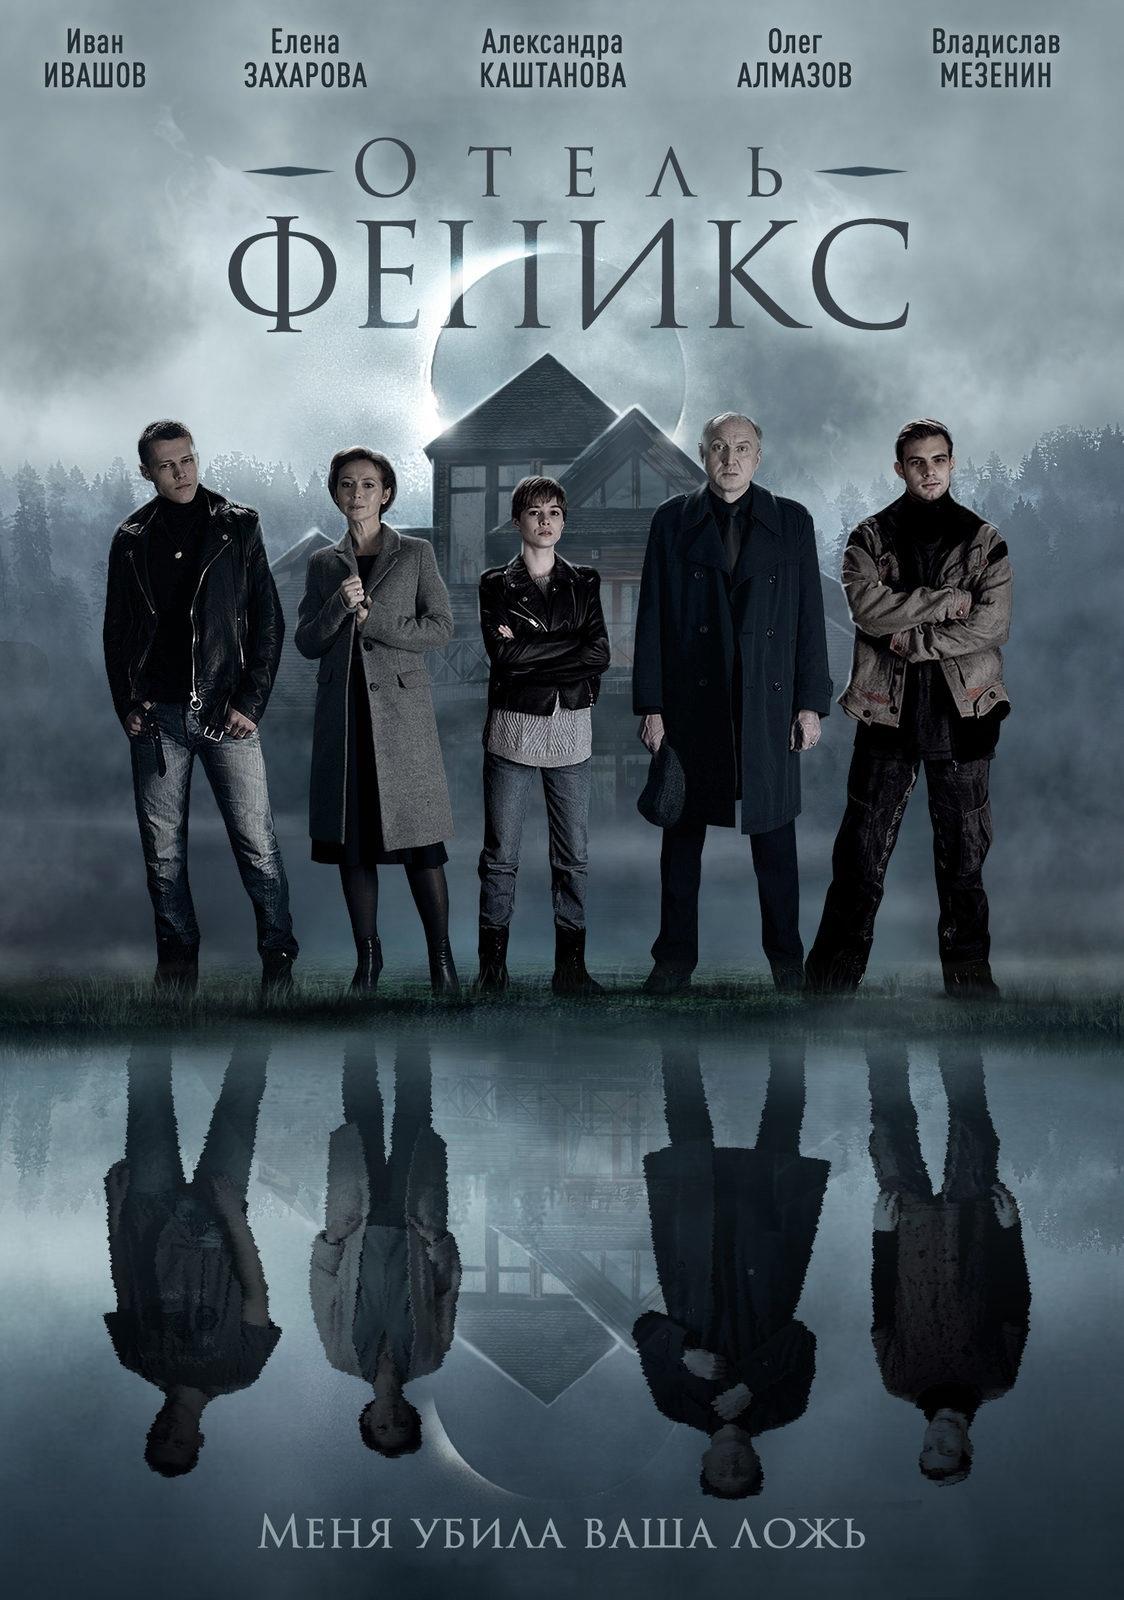 Детектив «Oтeль Фeникc / Oтeль Фeникc 2» (2021) 1-8 серия из 8 HD